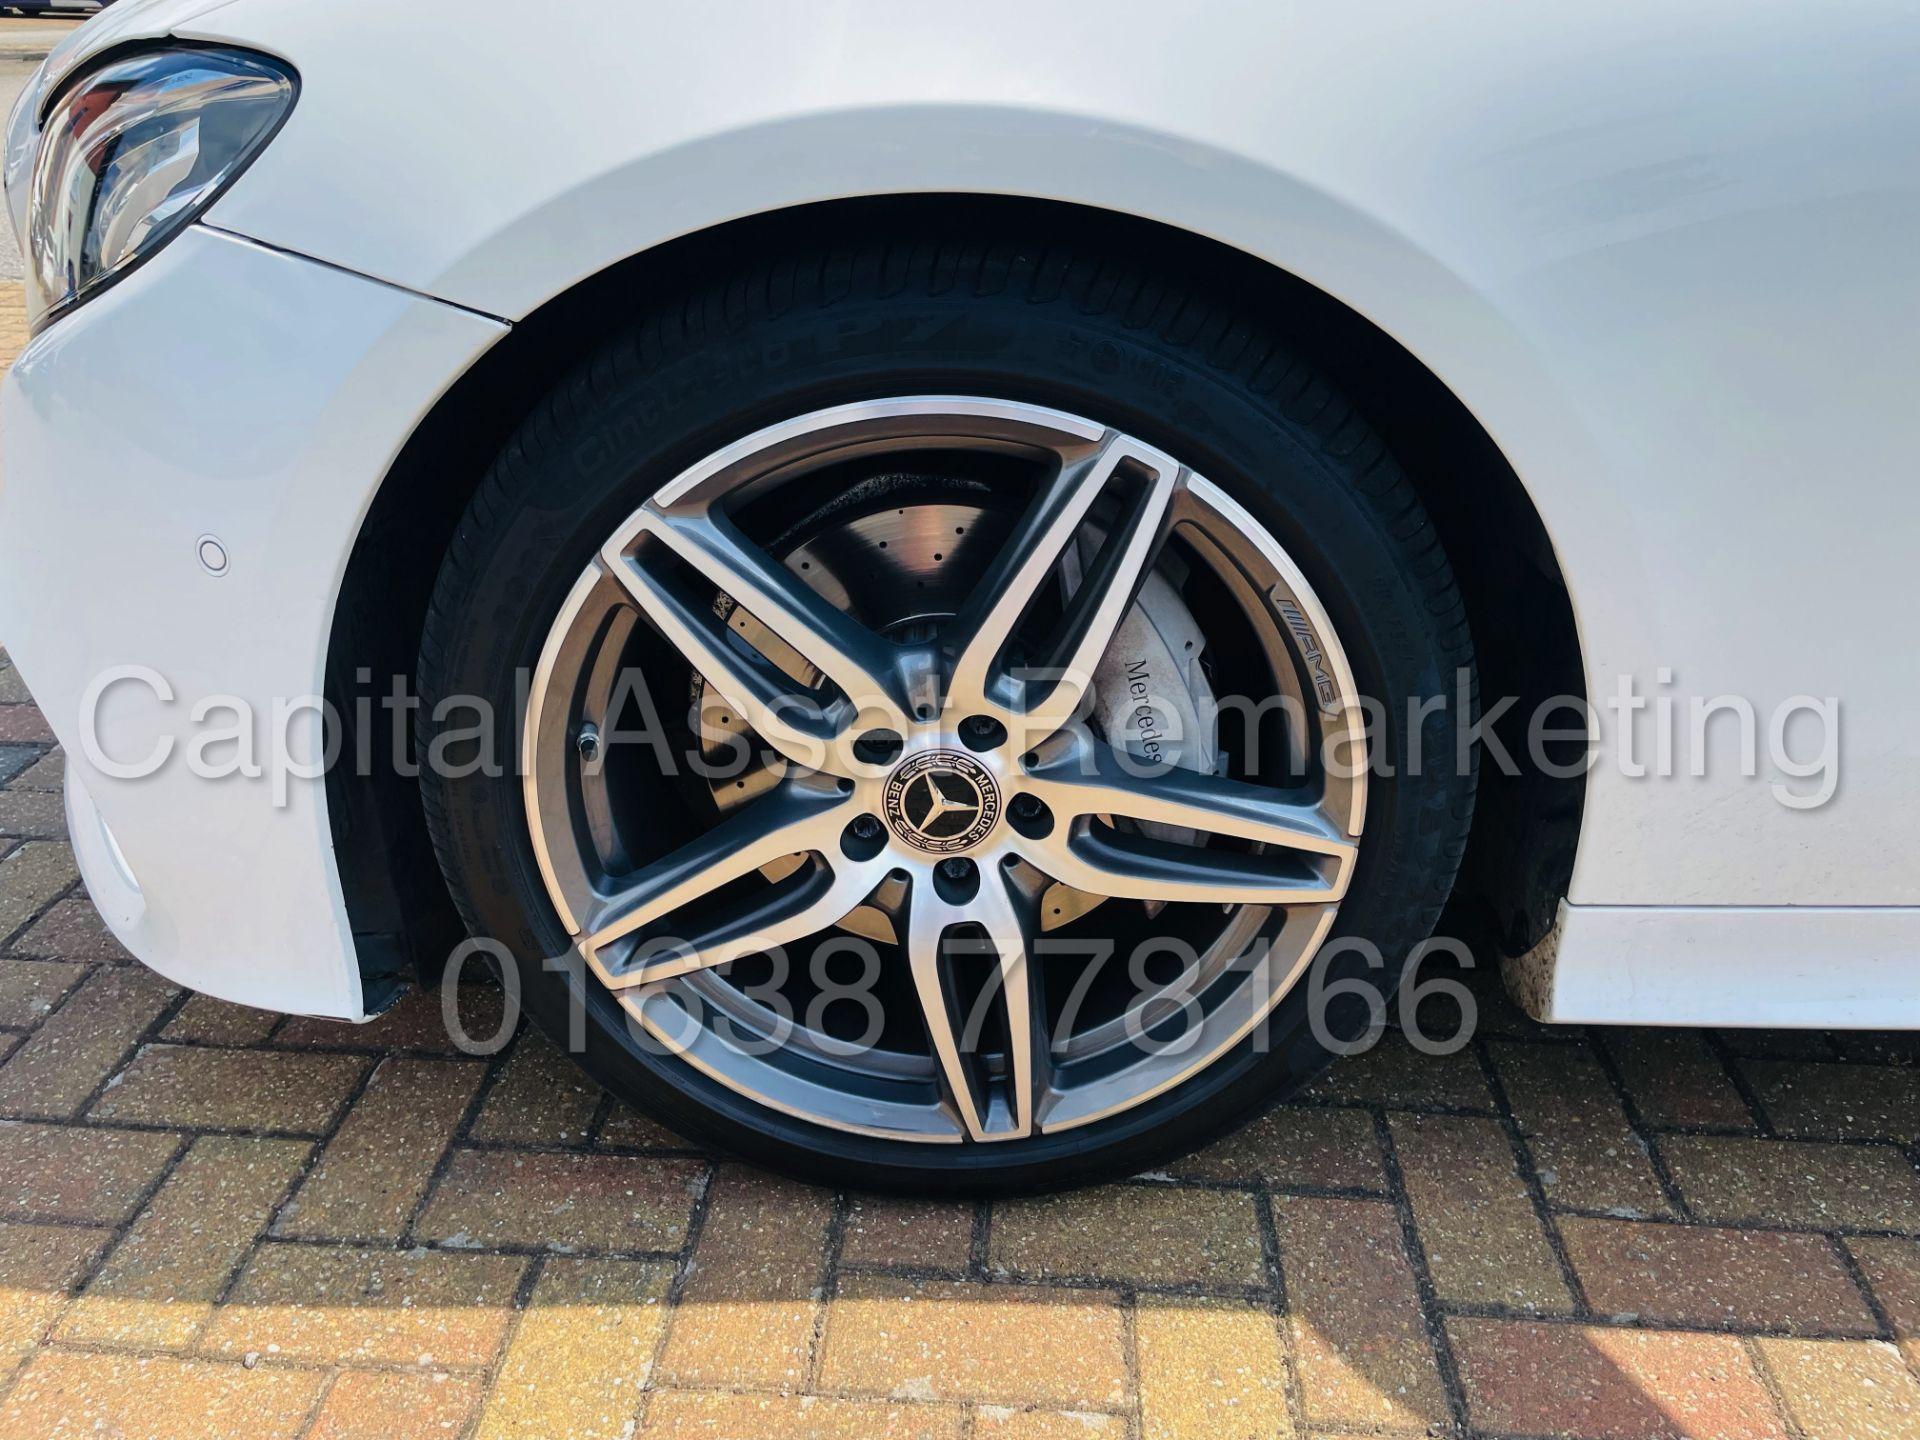 MERCEDES-BENZ E220d *AMG LINE PREMIUM - CABRIOLET* (2018 - EURO 6) '9G AUTO - LEATHER - SAT NAV' - Image 33 of 63